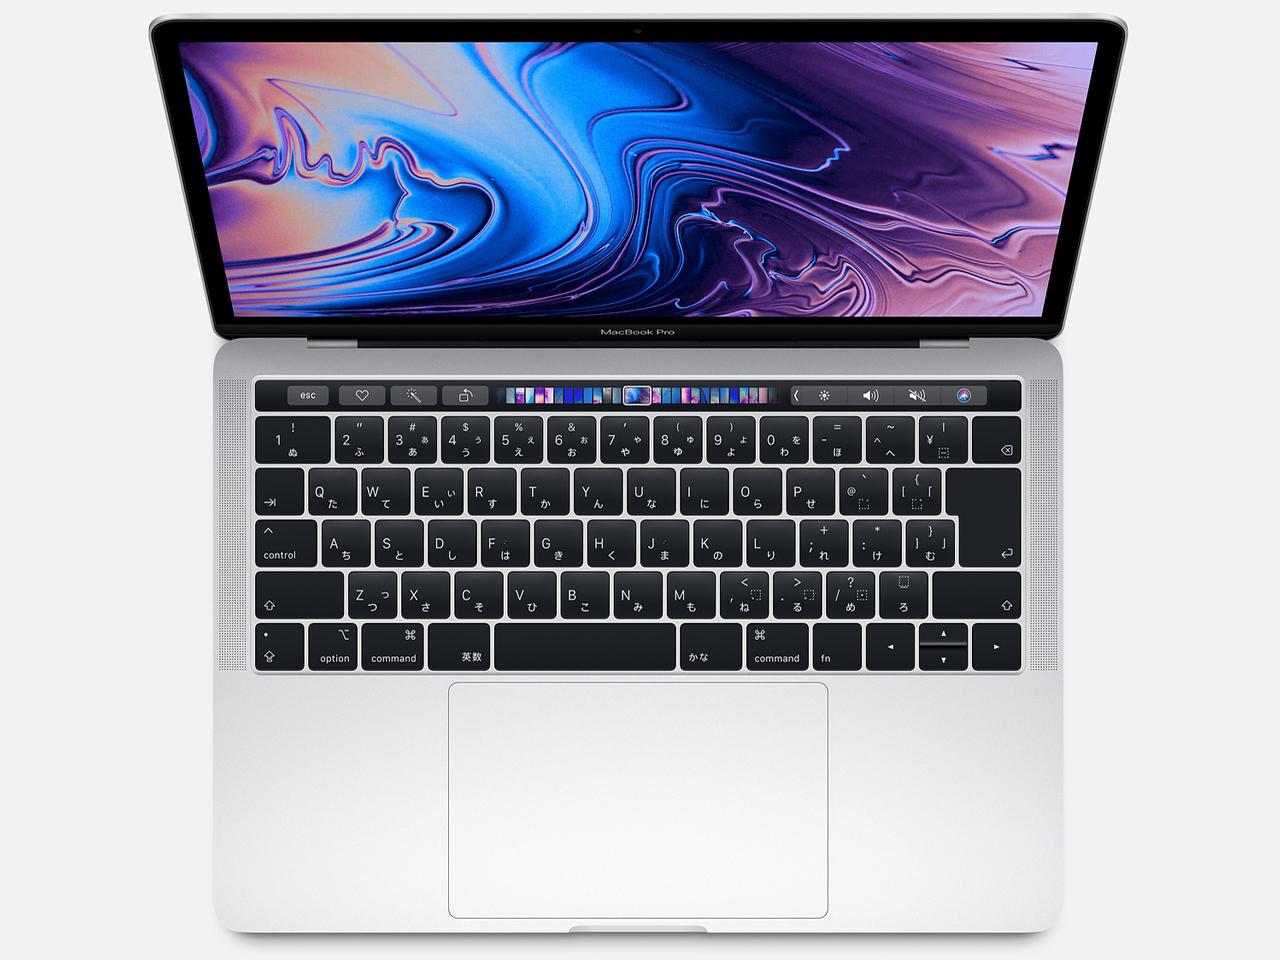 MacBook Pro (Retina, 13.3-inch, SSD 256GB, Touch Bar, 2019) MV992J/A シルバー